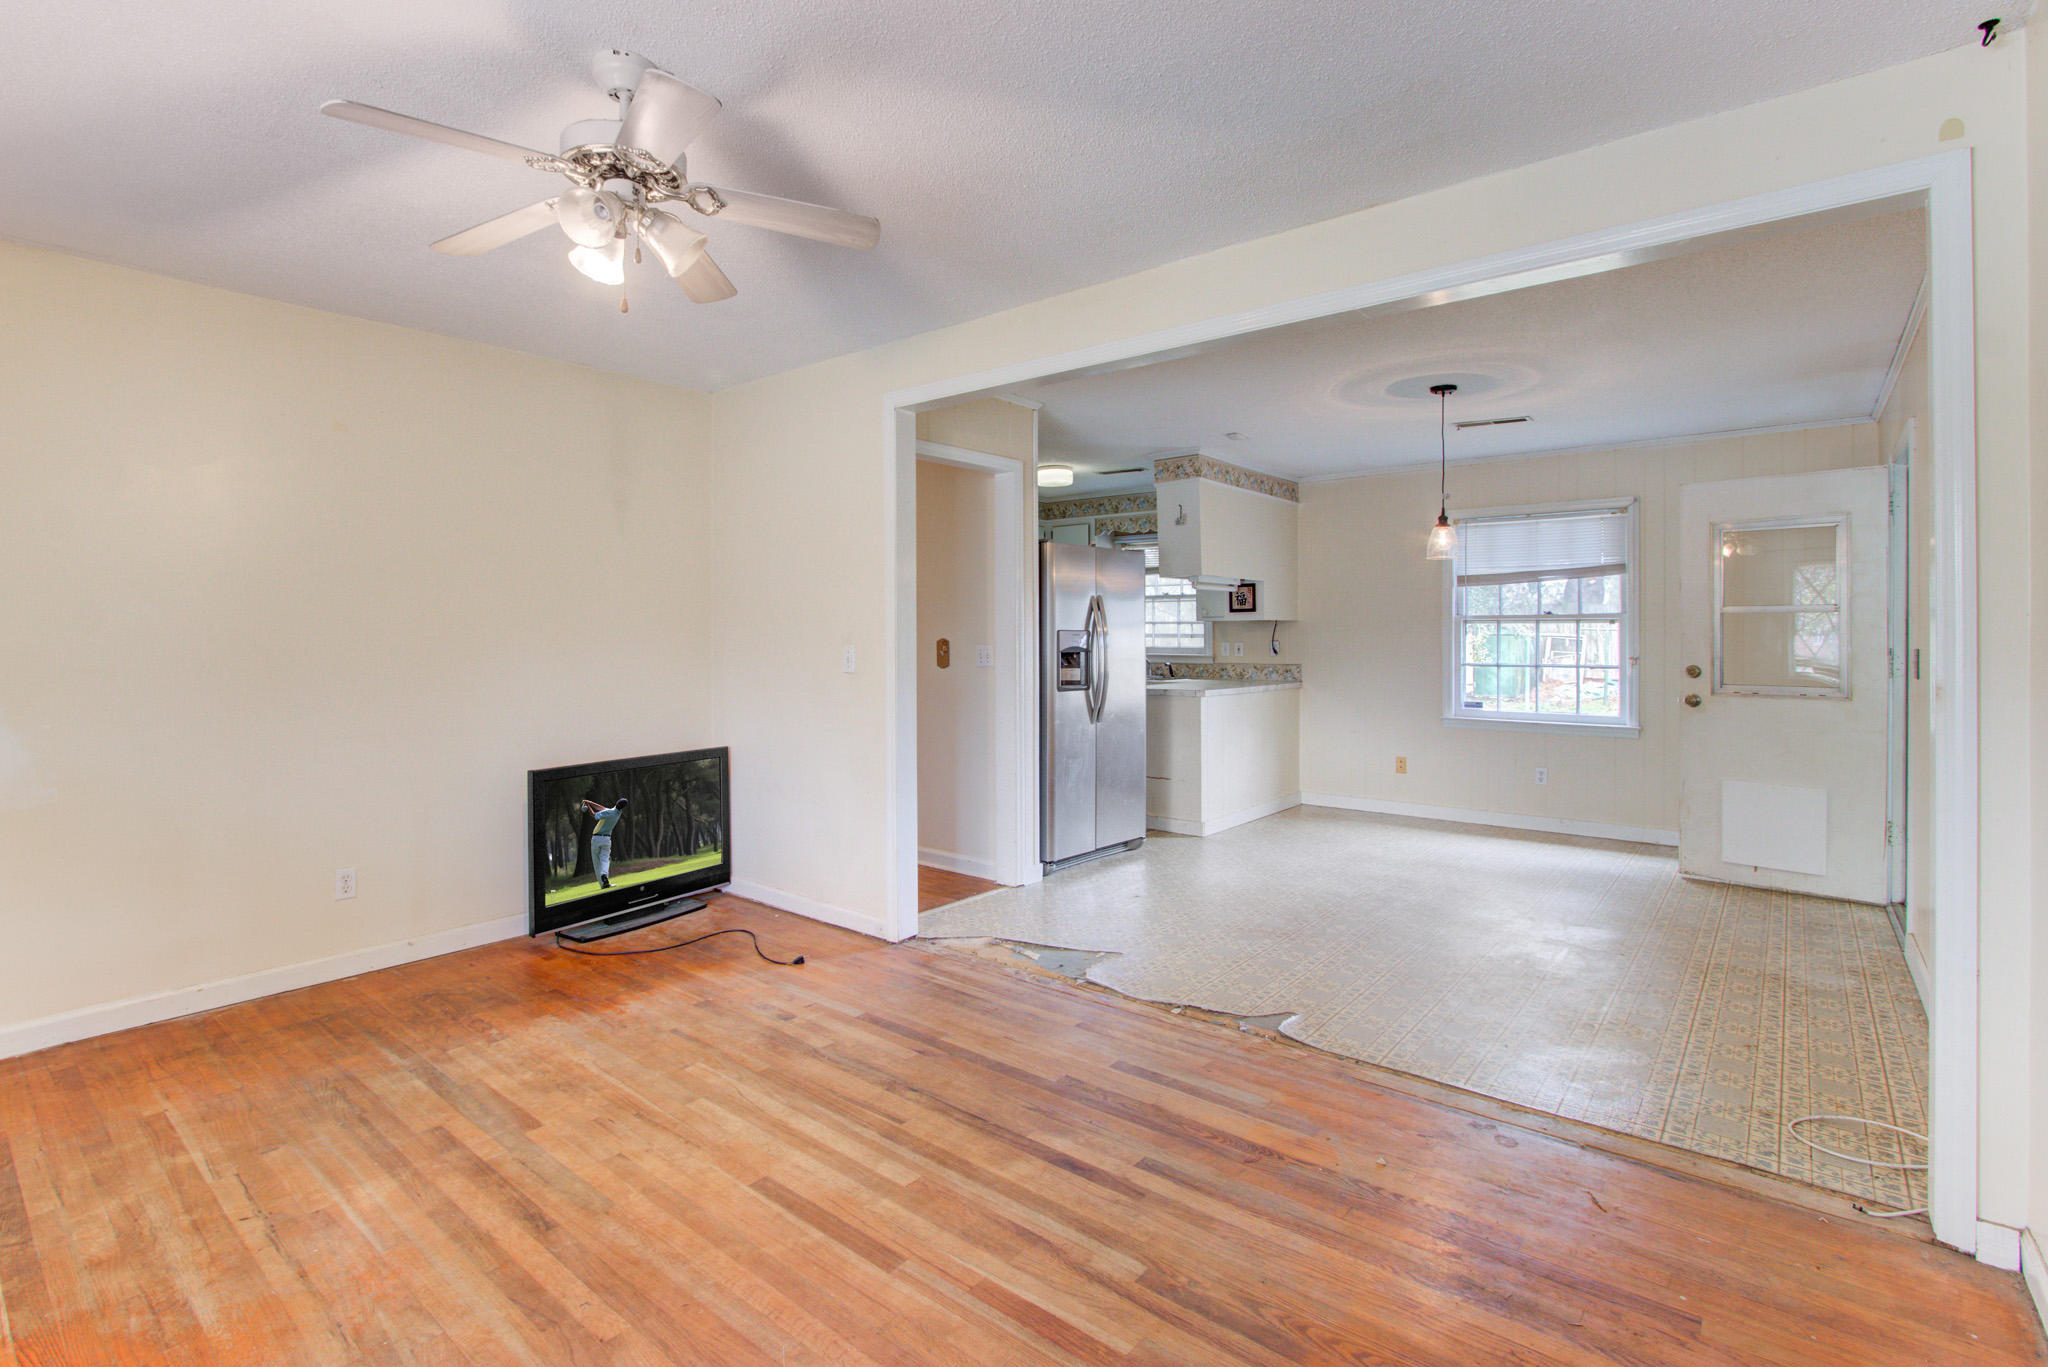 Bushy Park Terrace Homes For Sale - 125 Azalea, Goose Creek, SC - 19